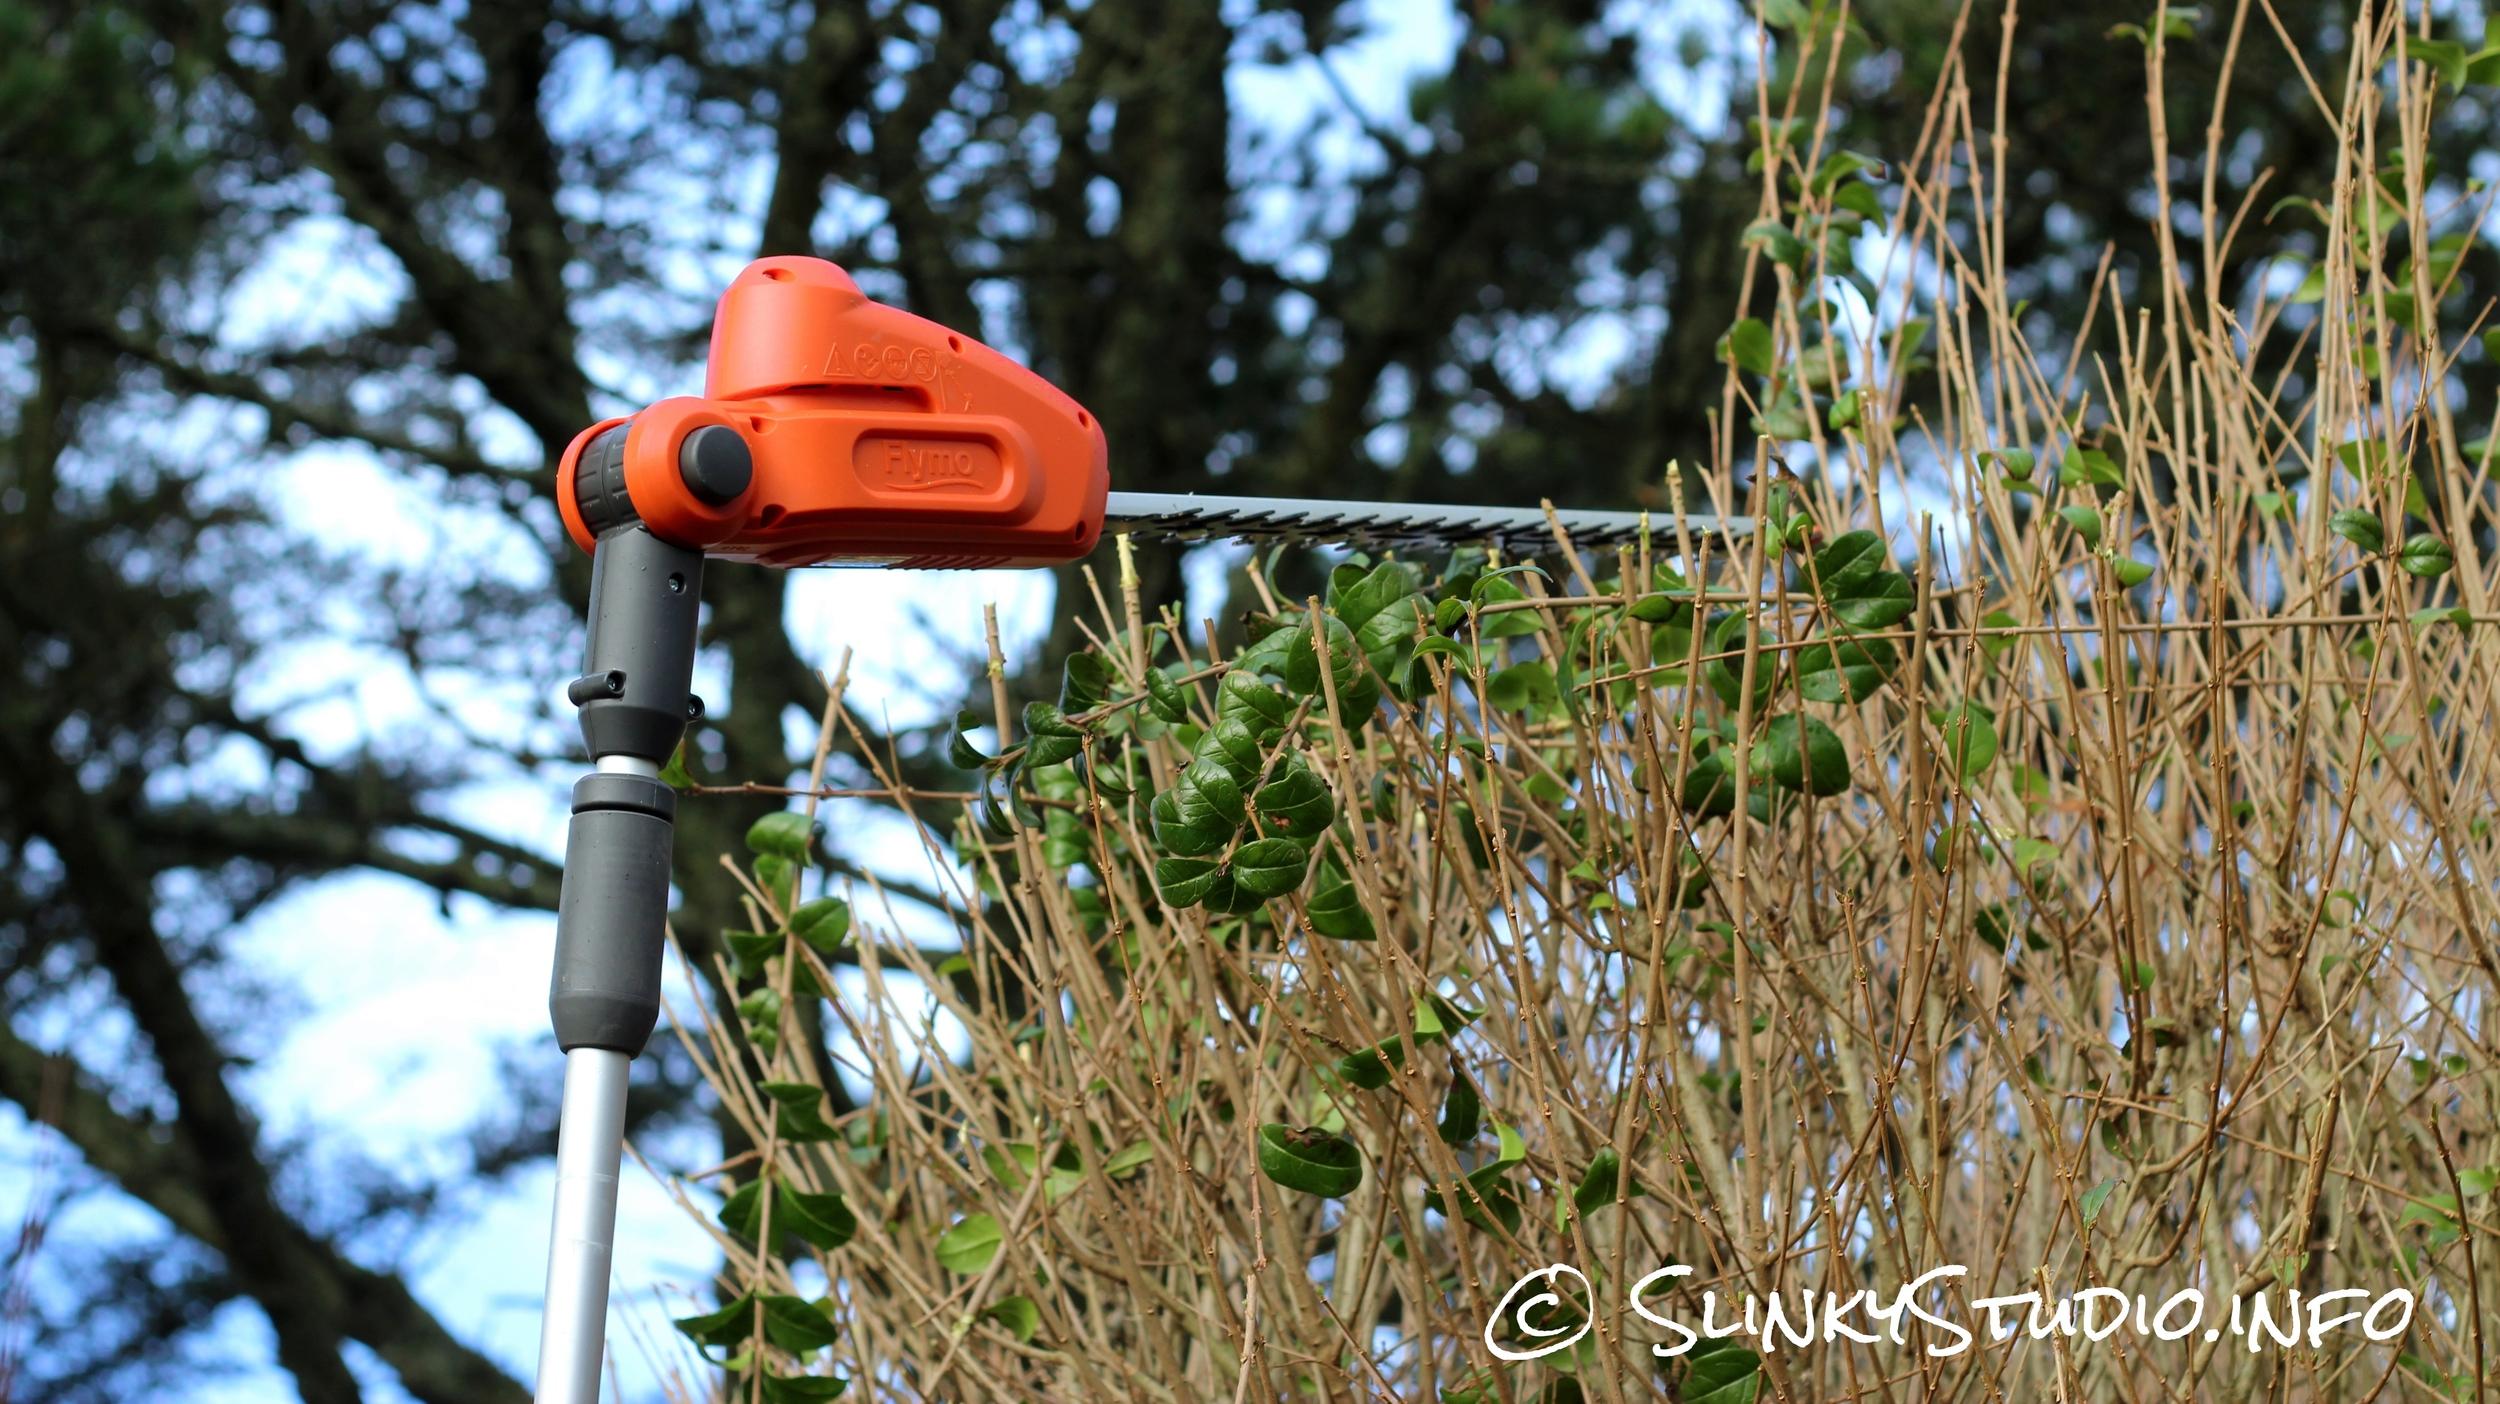 Flymo SabreCut XT Cordless Hedge Trimmer